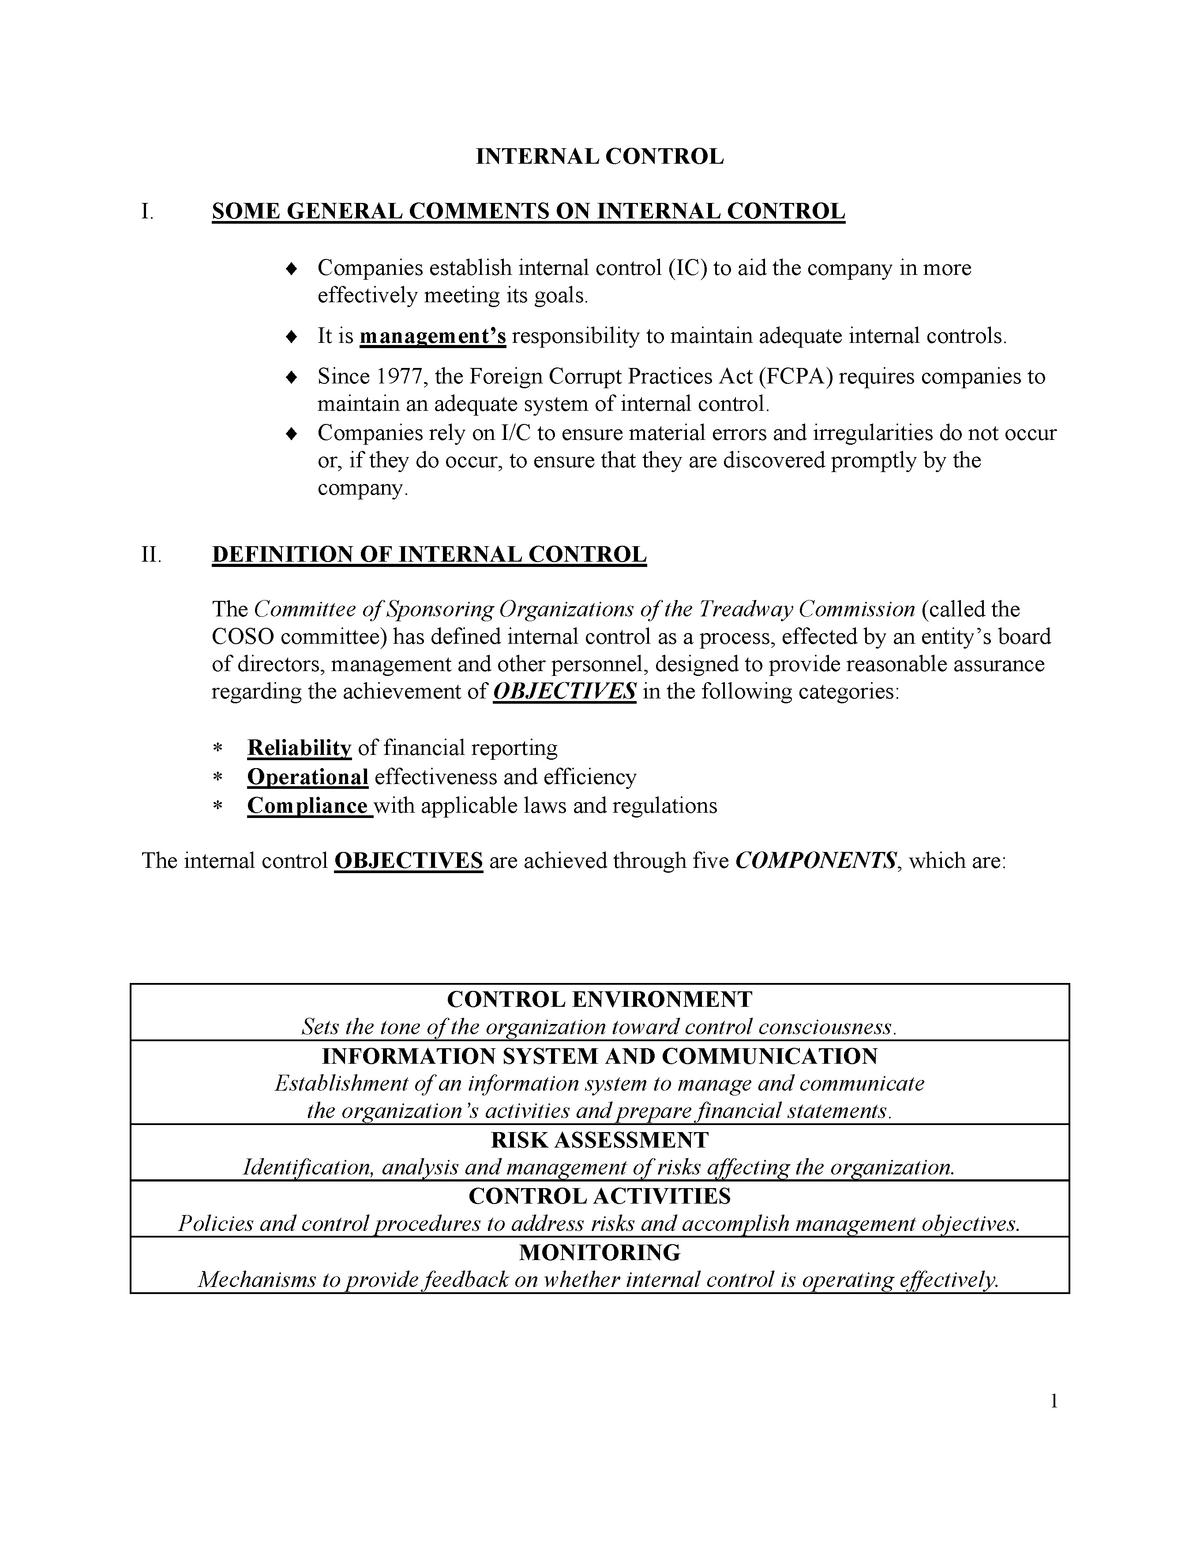 05generalinternalcontrol-notes sky - ac210: Audit - StuDocu